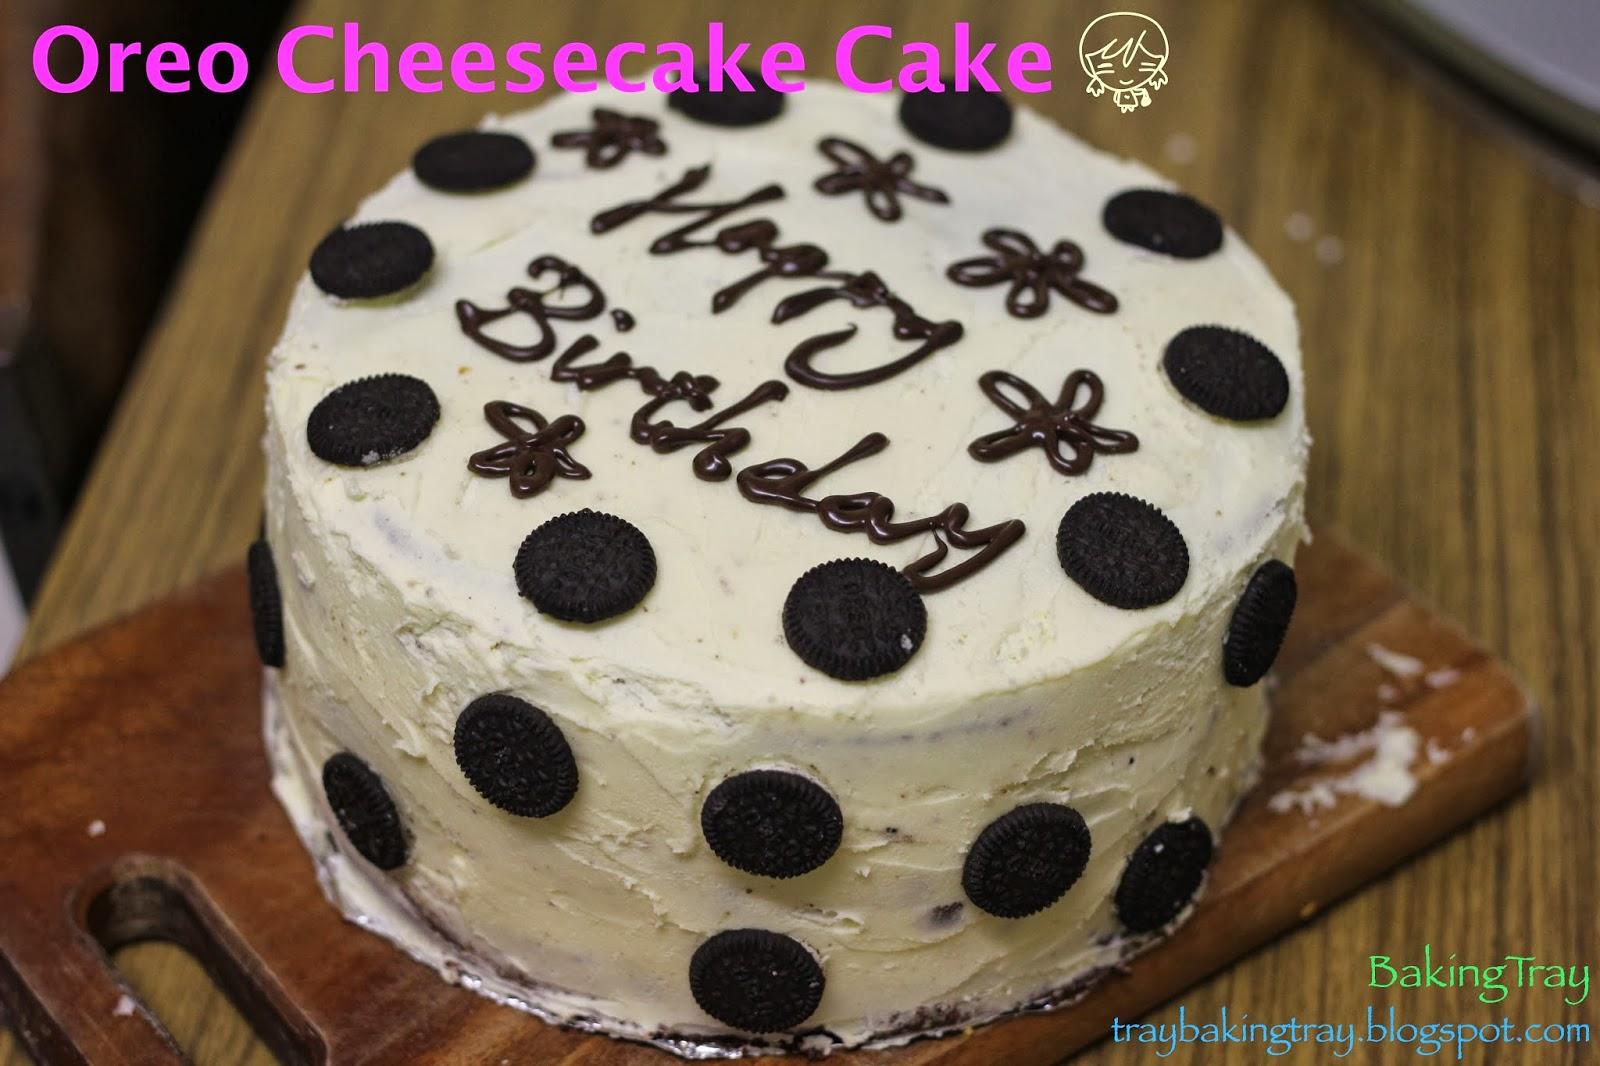 Baking Tray Birthday Bake Oreo Cheesecake Cake